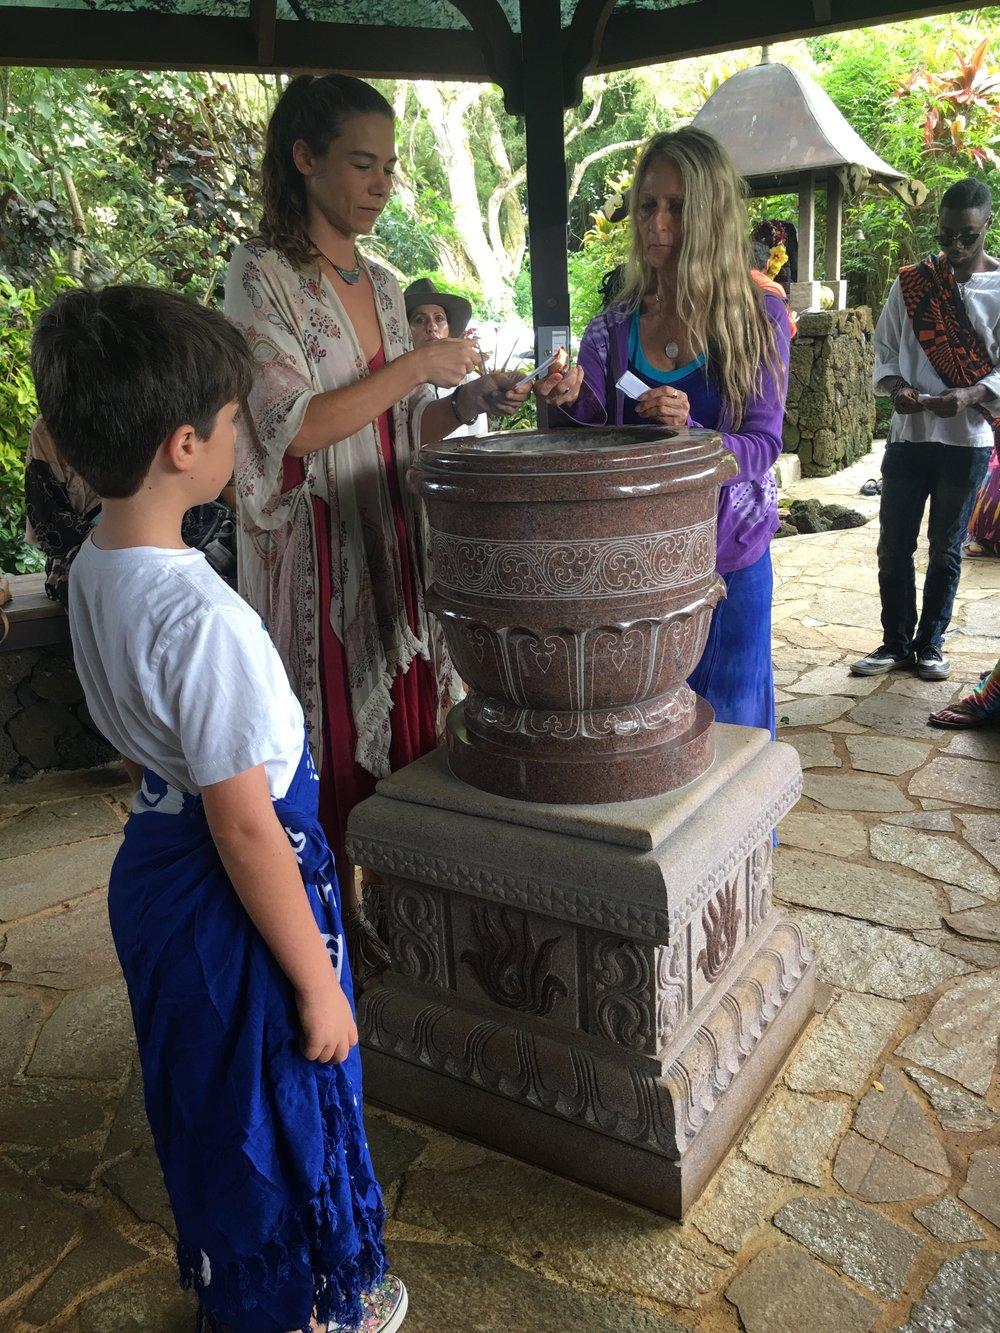 Puja at the Kauai Hindu Temple